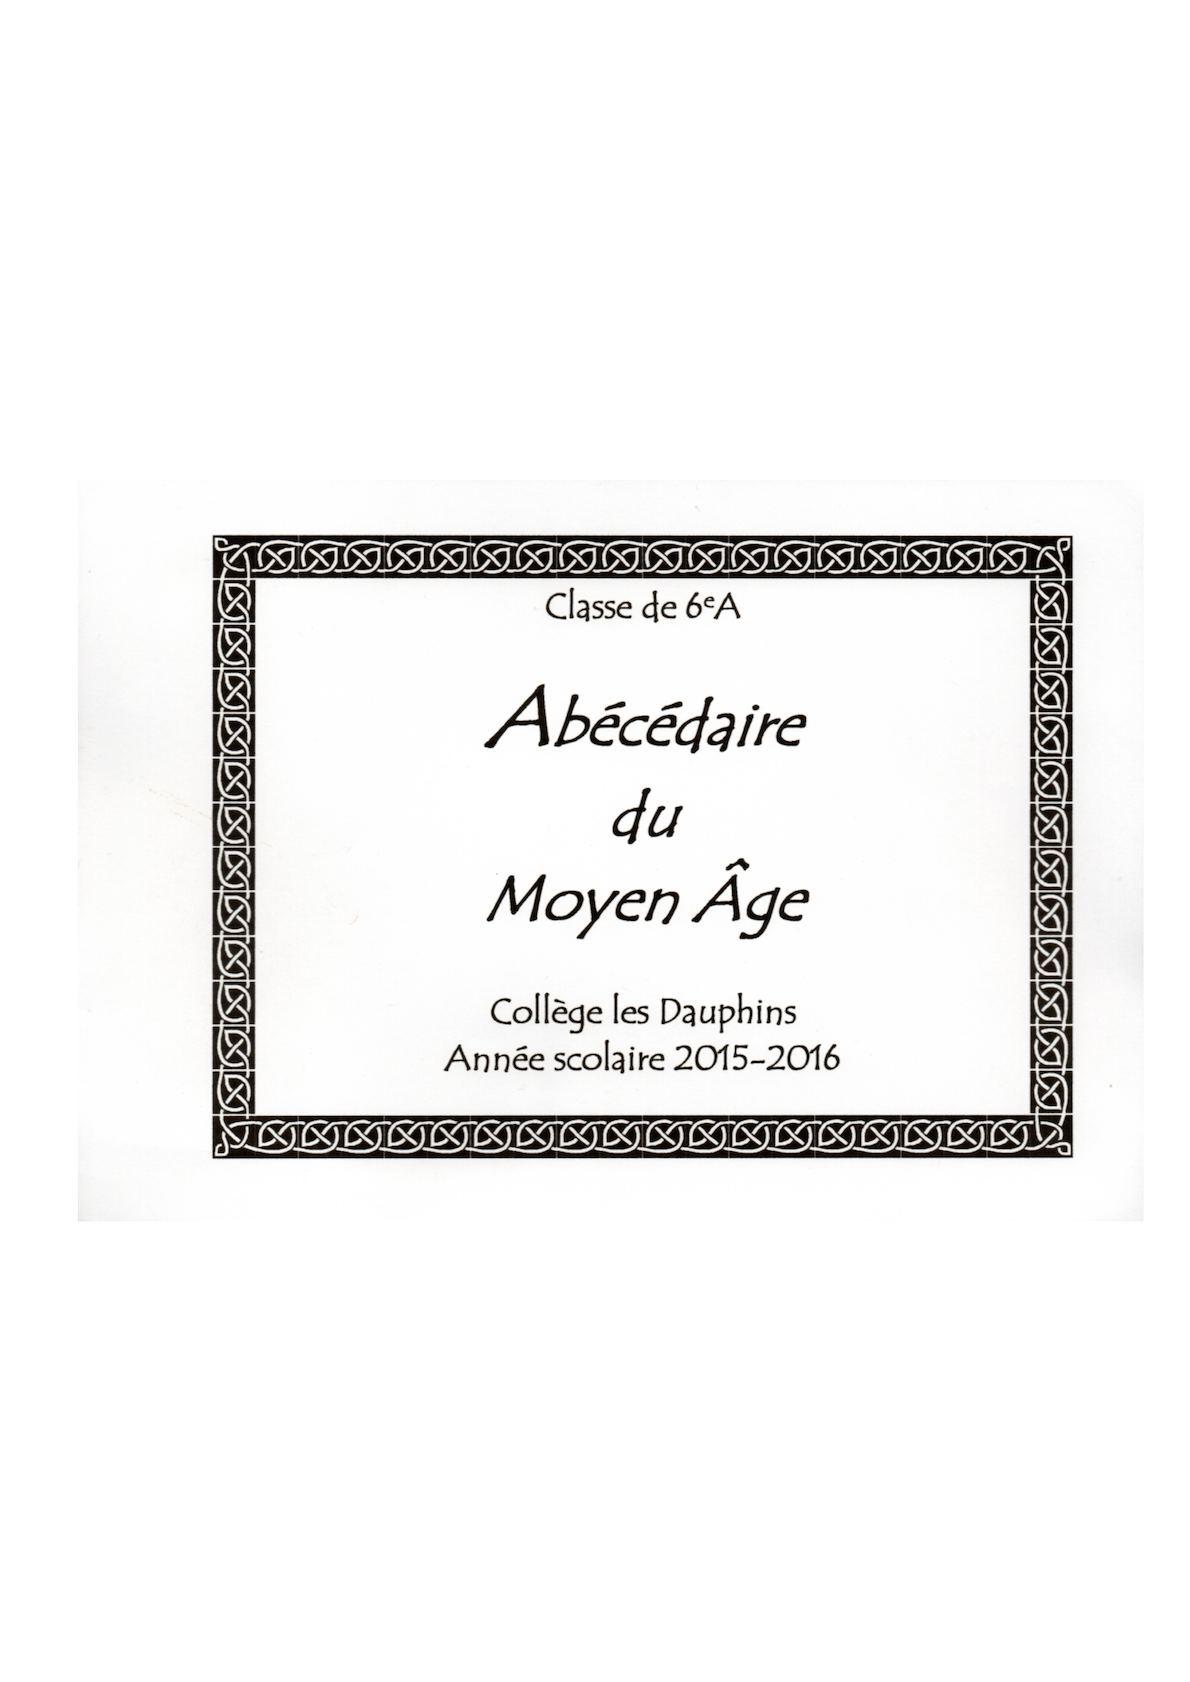 Calameo Abecedaire Sur Le Moyen Age